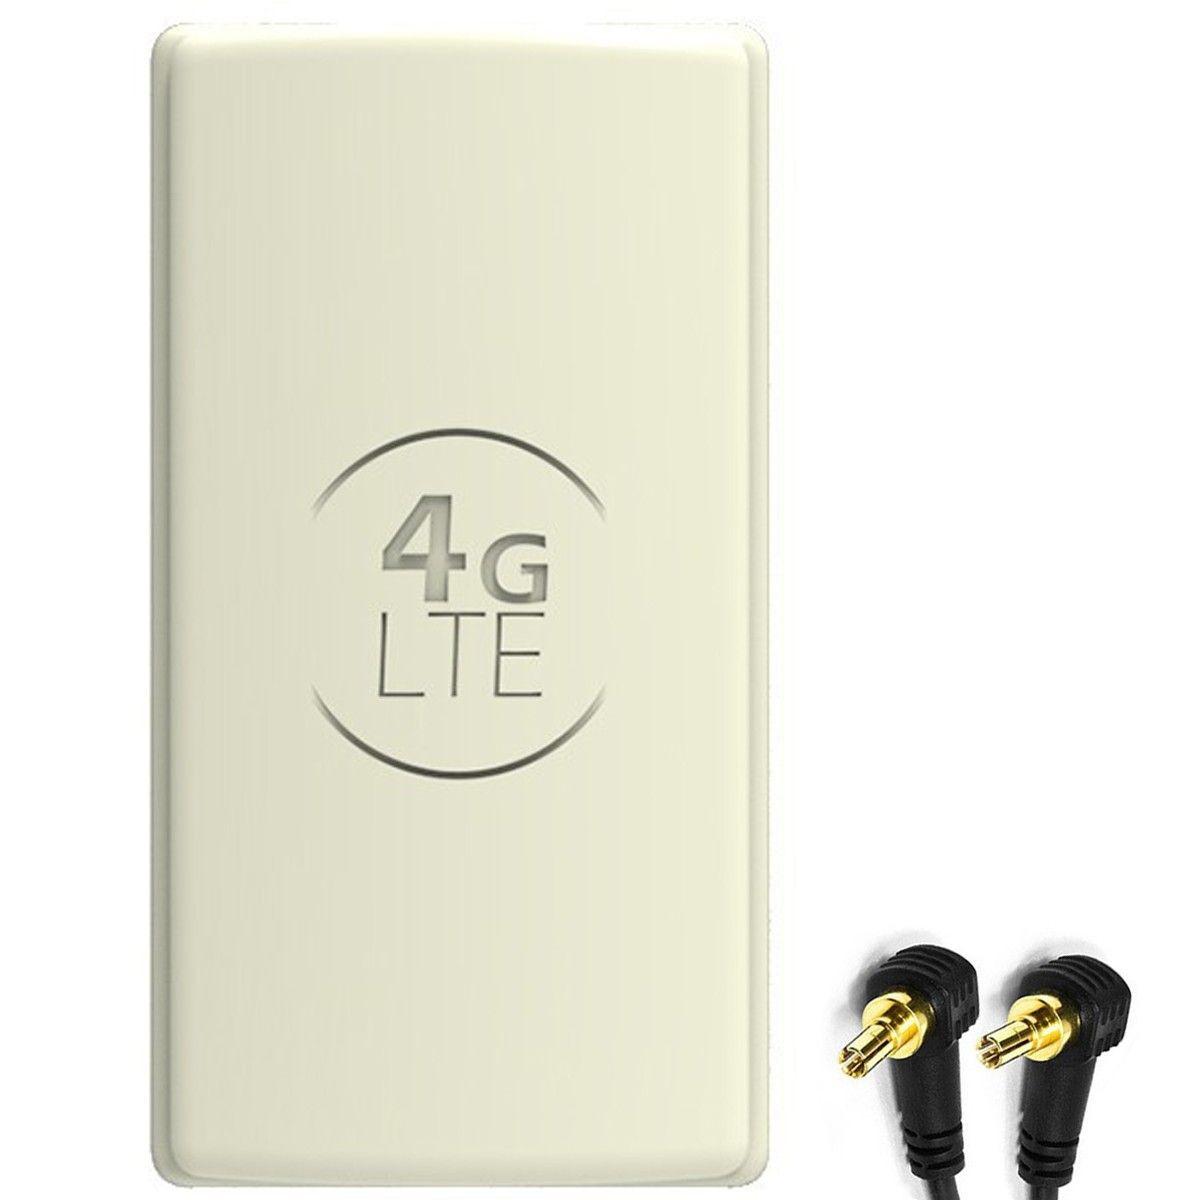 Antena 4G LTE DUAL PANEL 2x25dbi + 2x10m SZARA + 2x CRC9